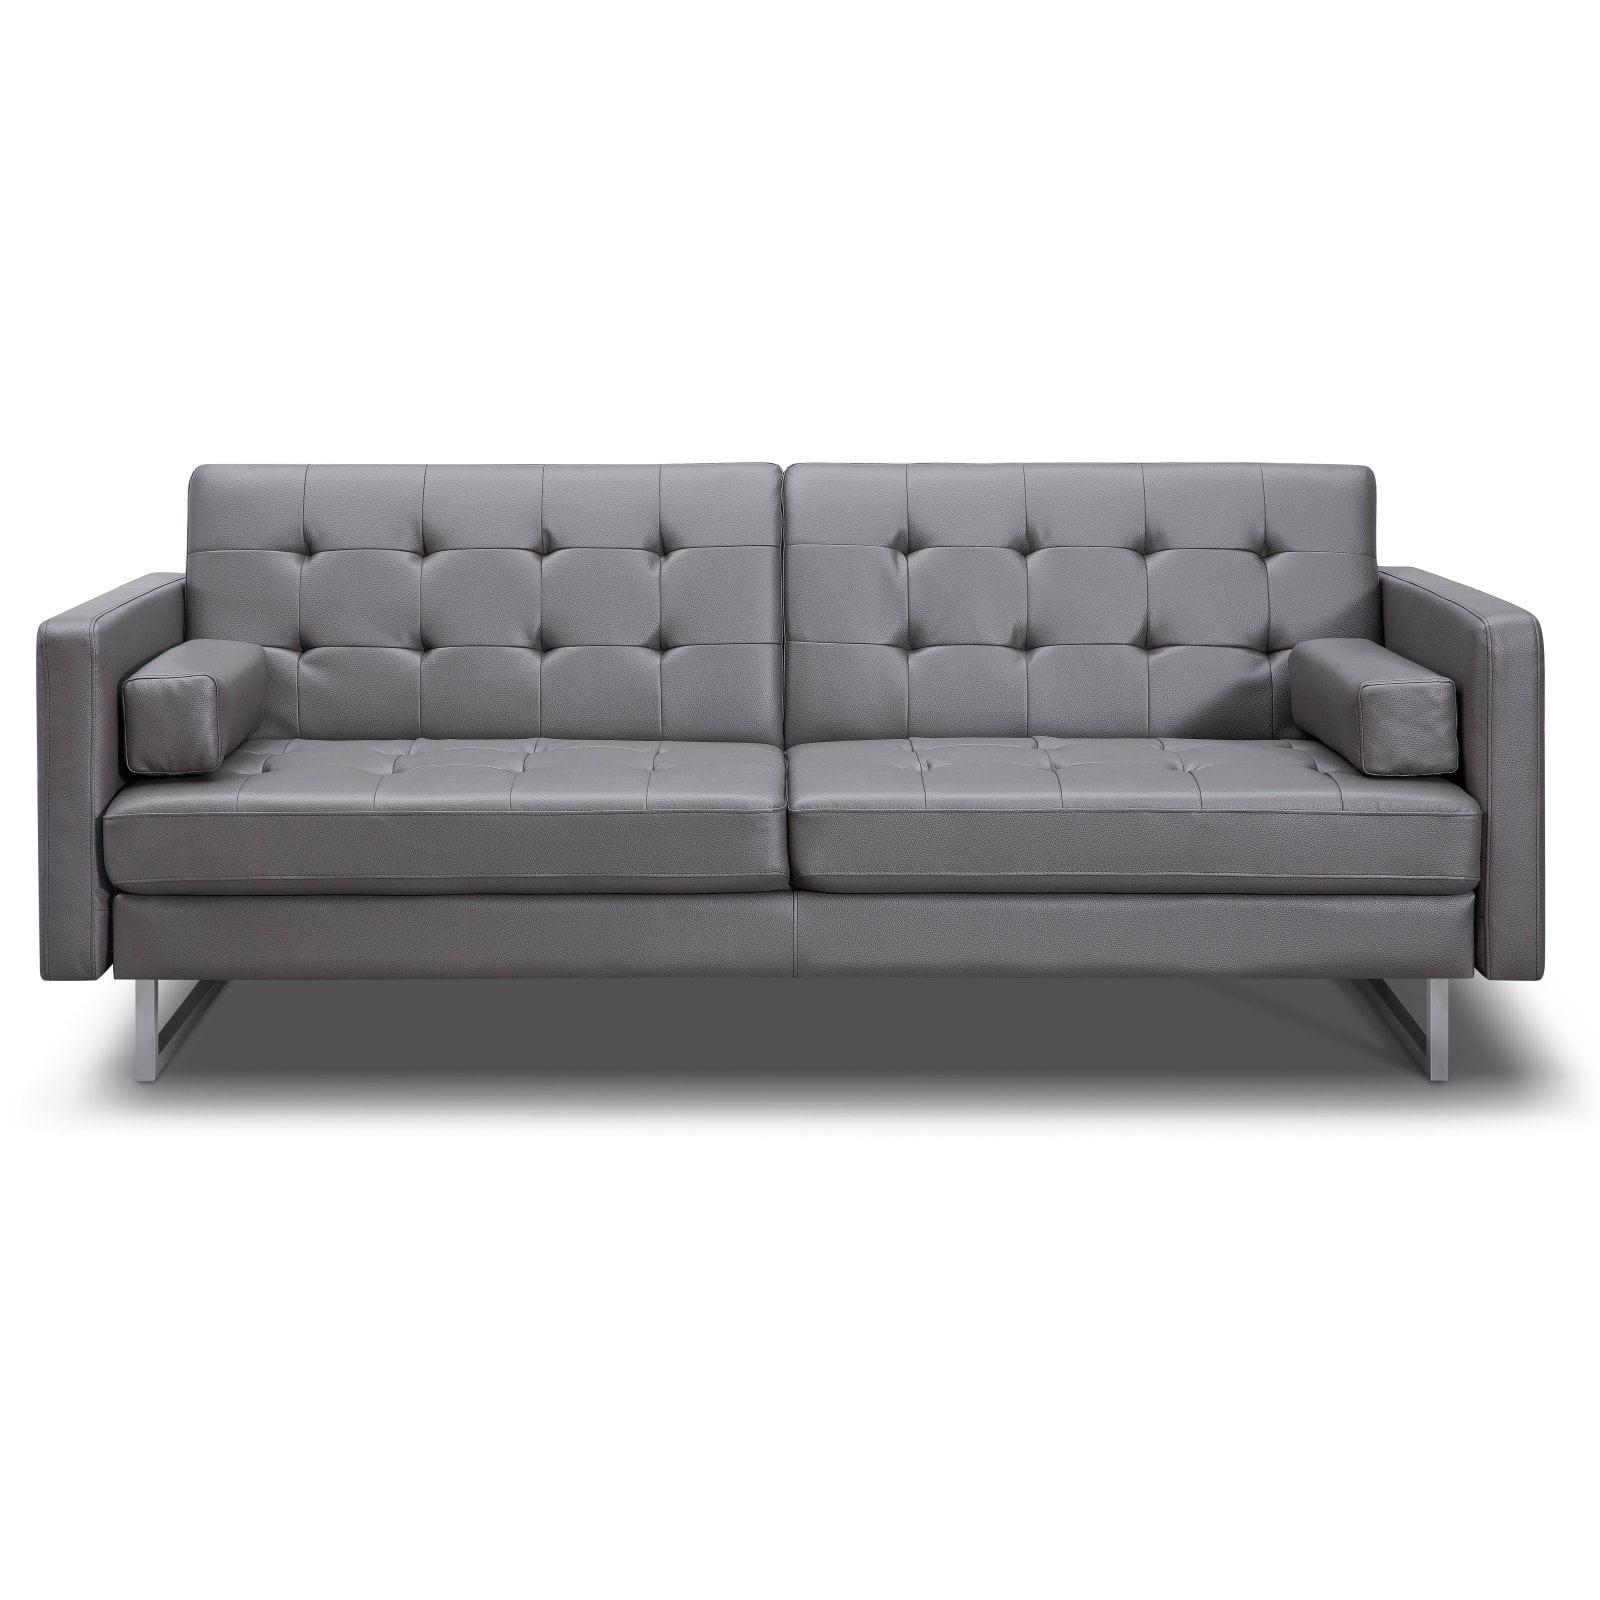 Superb Contemporary Leather Sofa Bed Download Free Architecture Designs Xoliawazosbritishbridgeorg